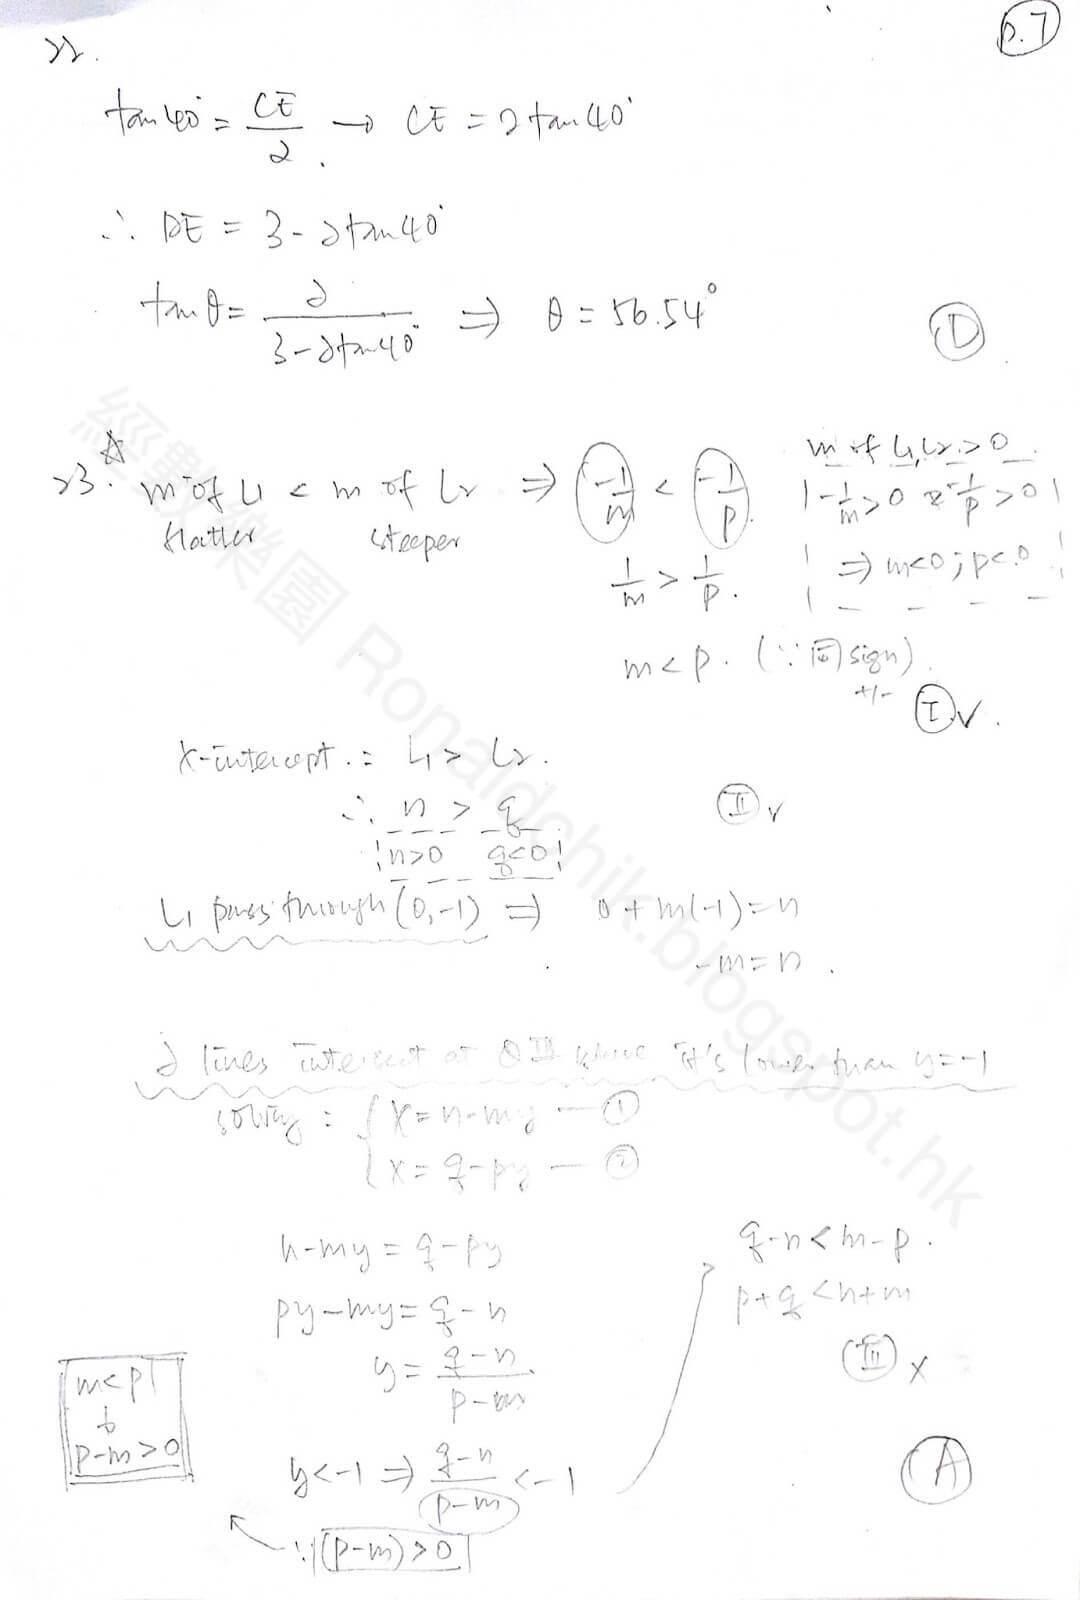 2017 DSE Math 卷二 Paper 2 MC 每條問題詳解 Part 1 (Q.1-23) - 經數樂園-學習變有趣~ |||[補習(小組|私人)]